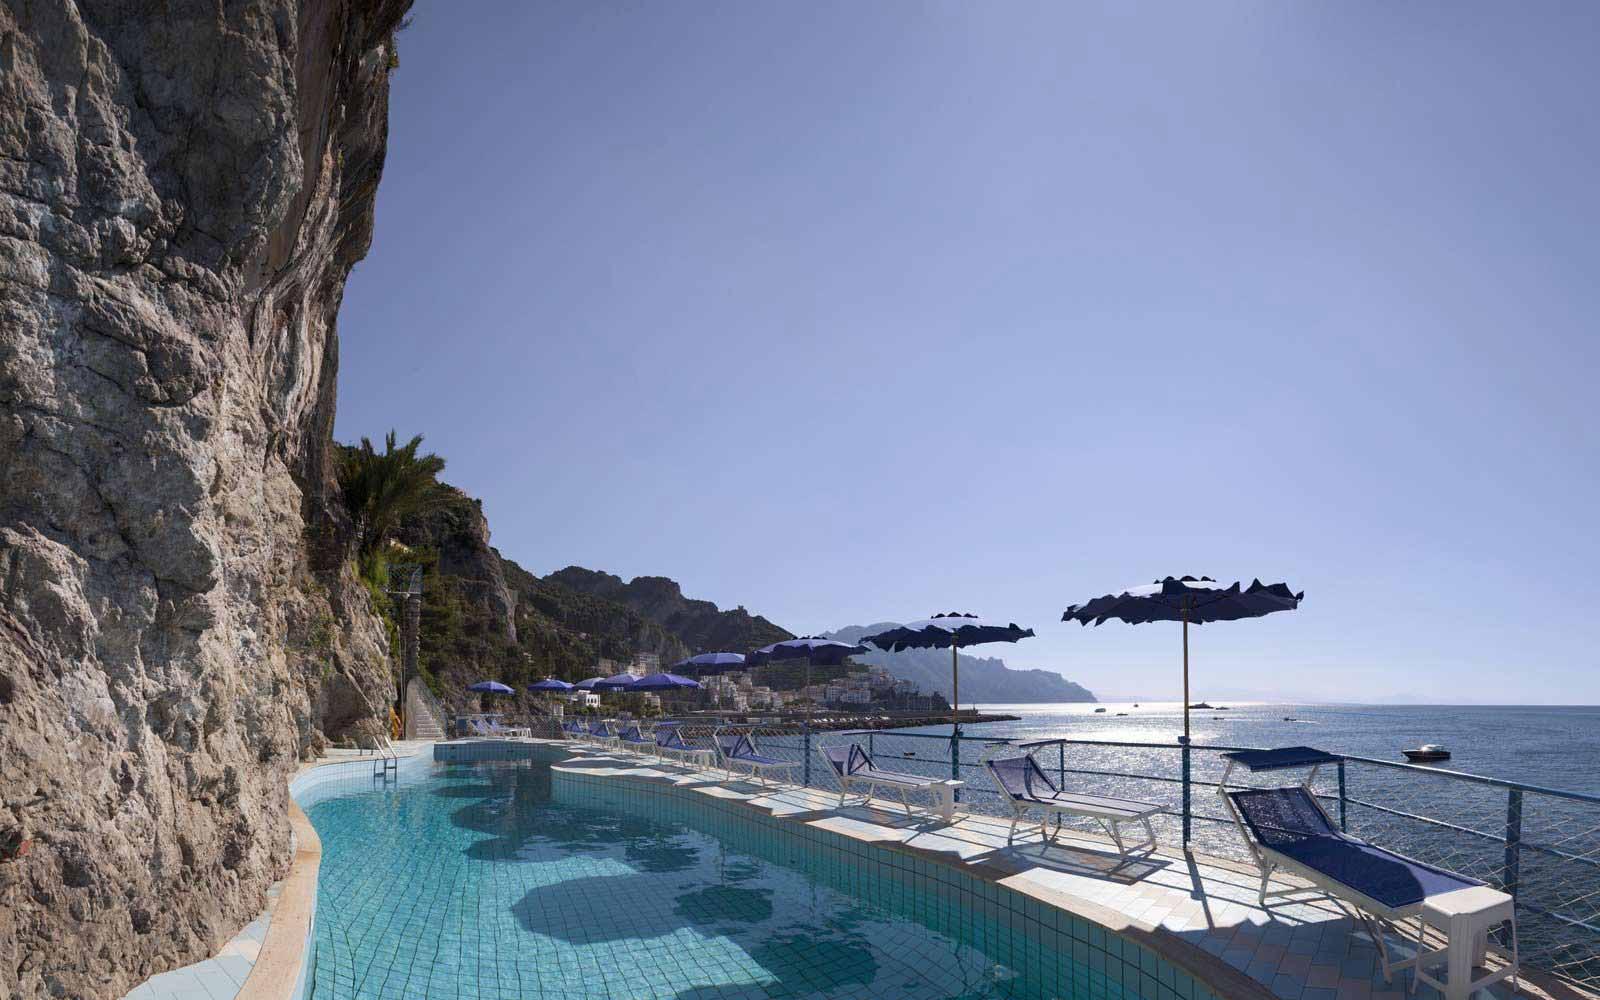 Views from the pool at Hotel Miramalfi